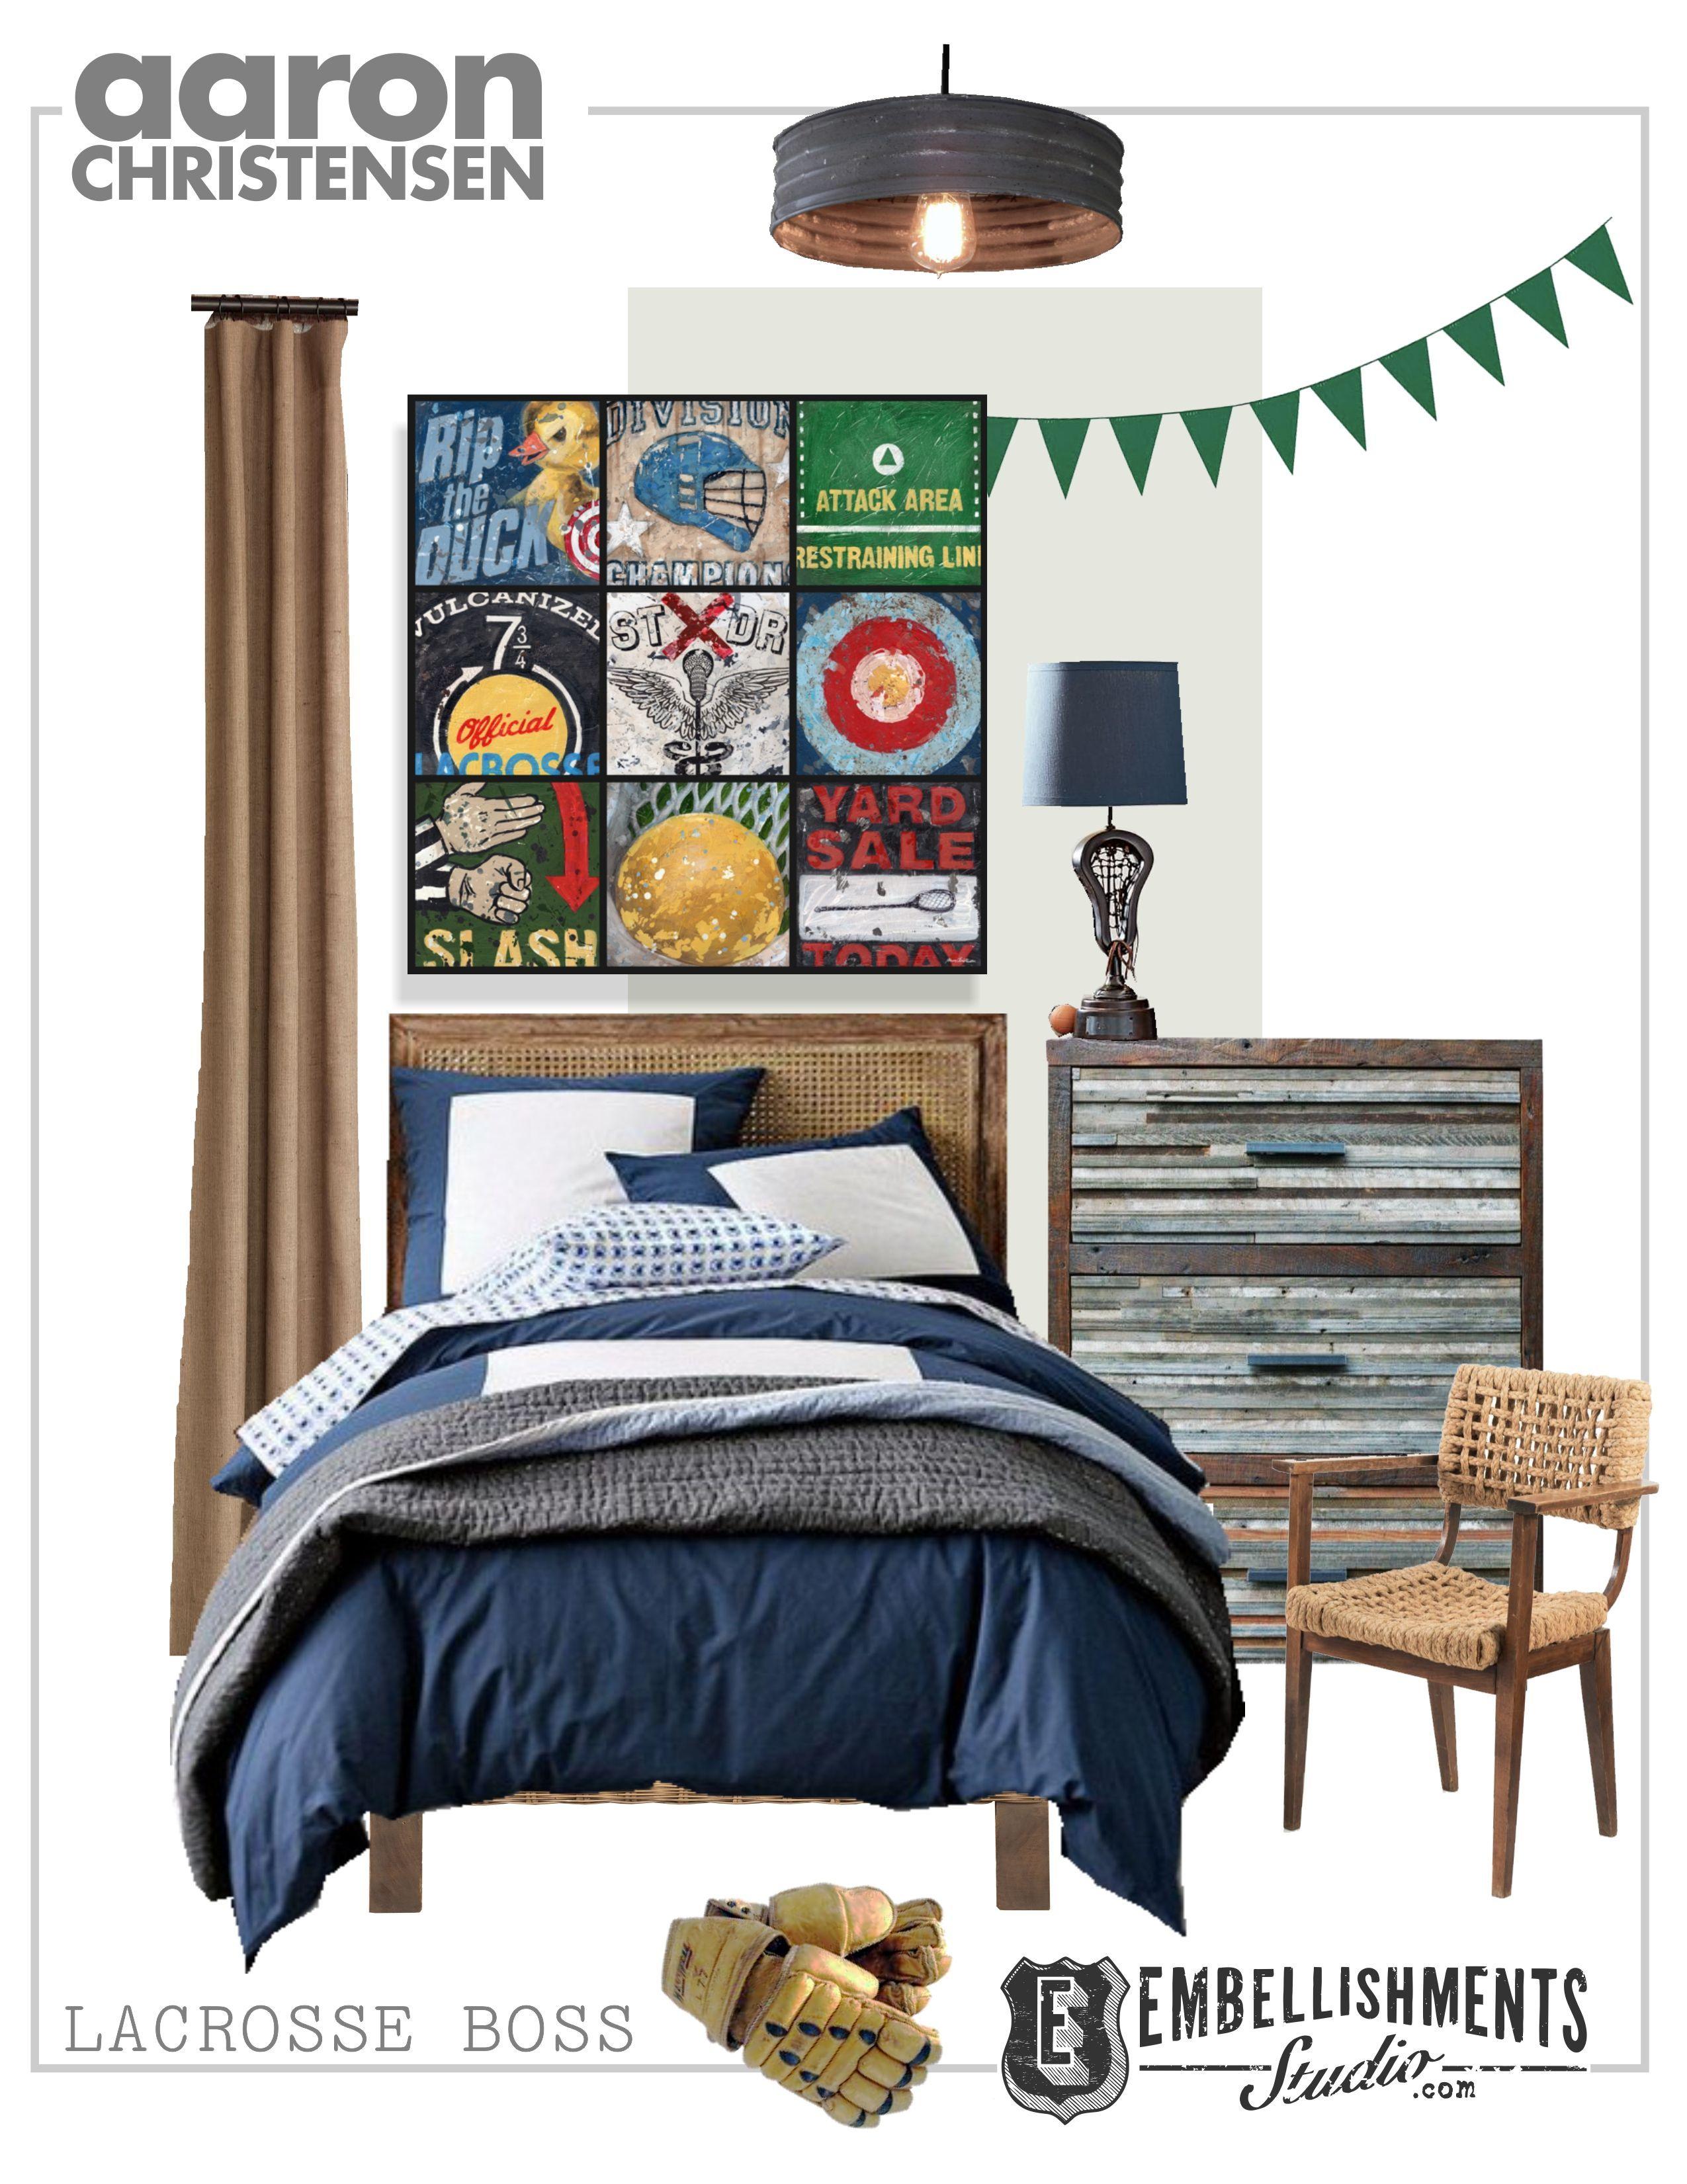 aaron christensen bedrooms low budget interior design rh iroooxpesi elitescloset store